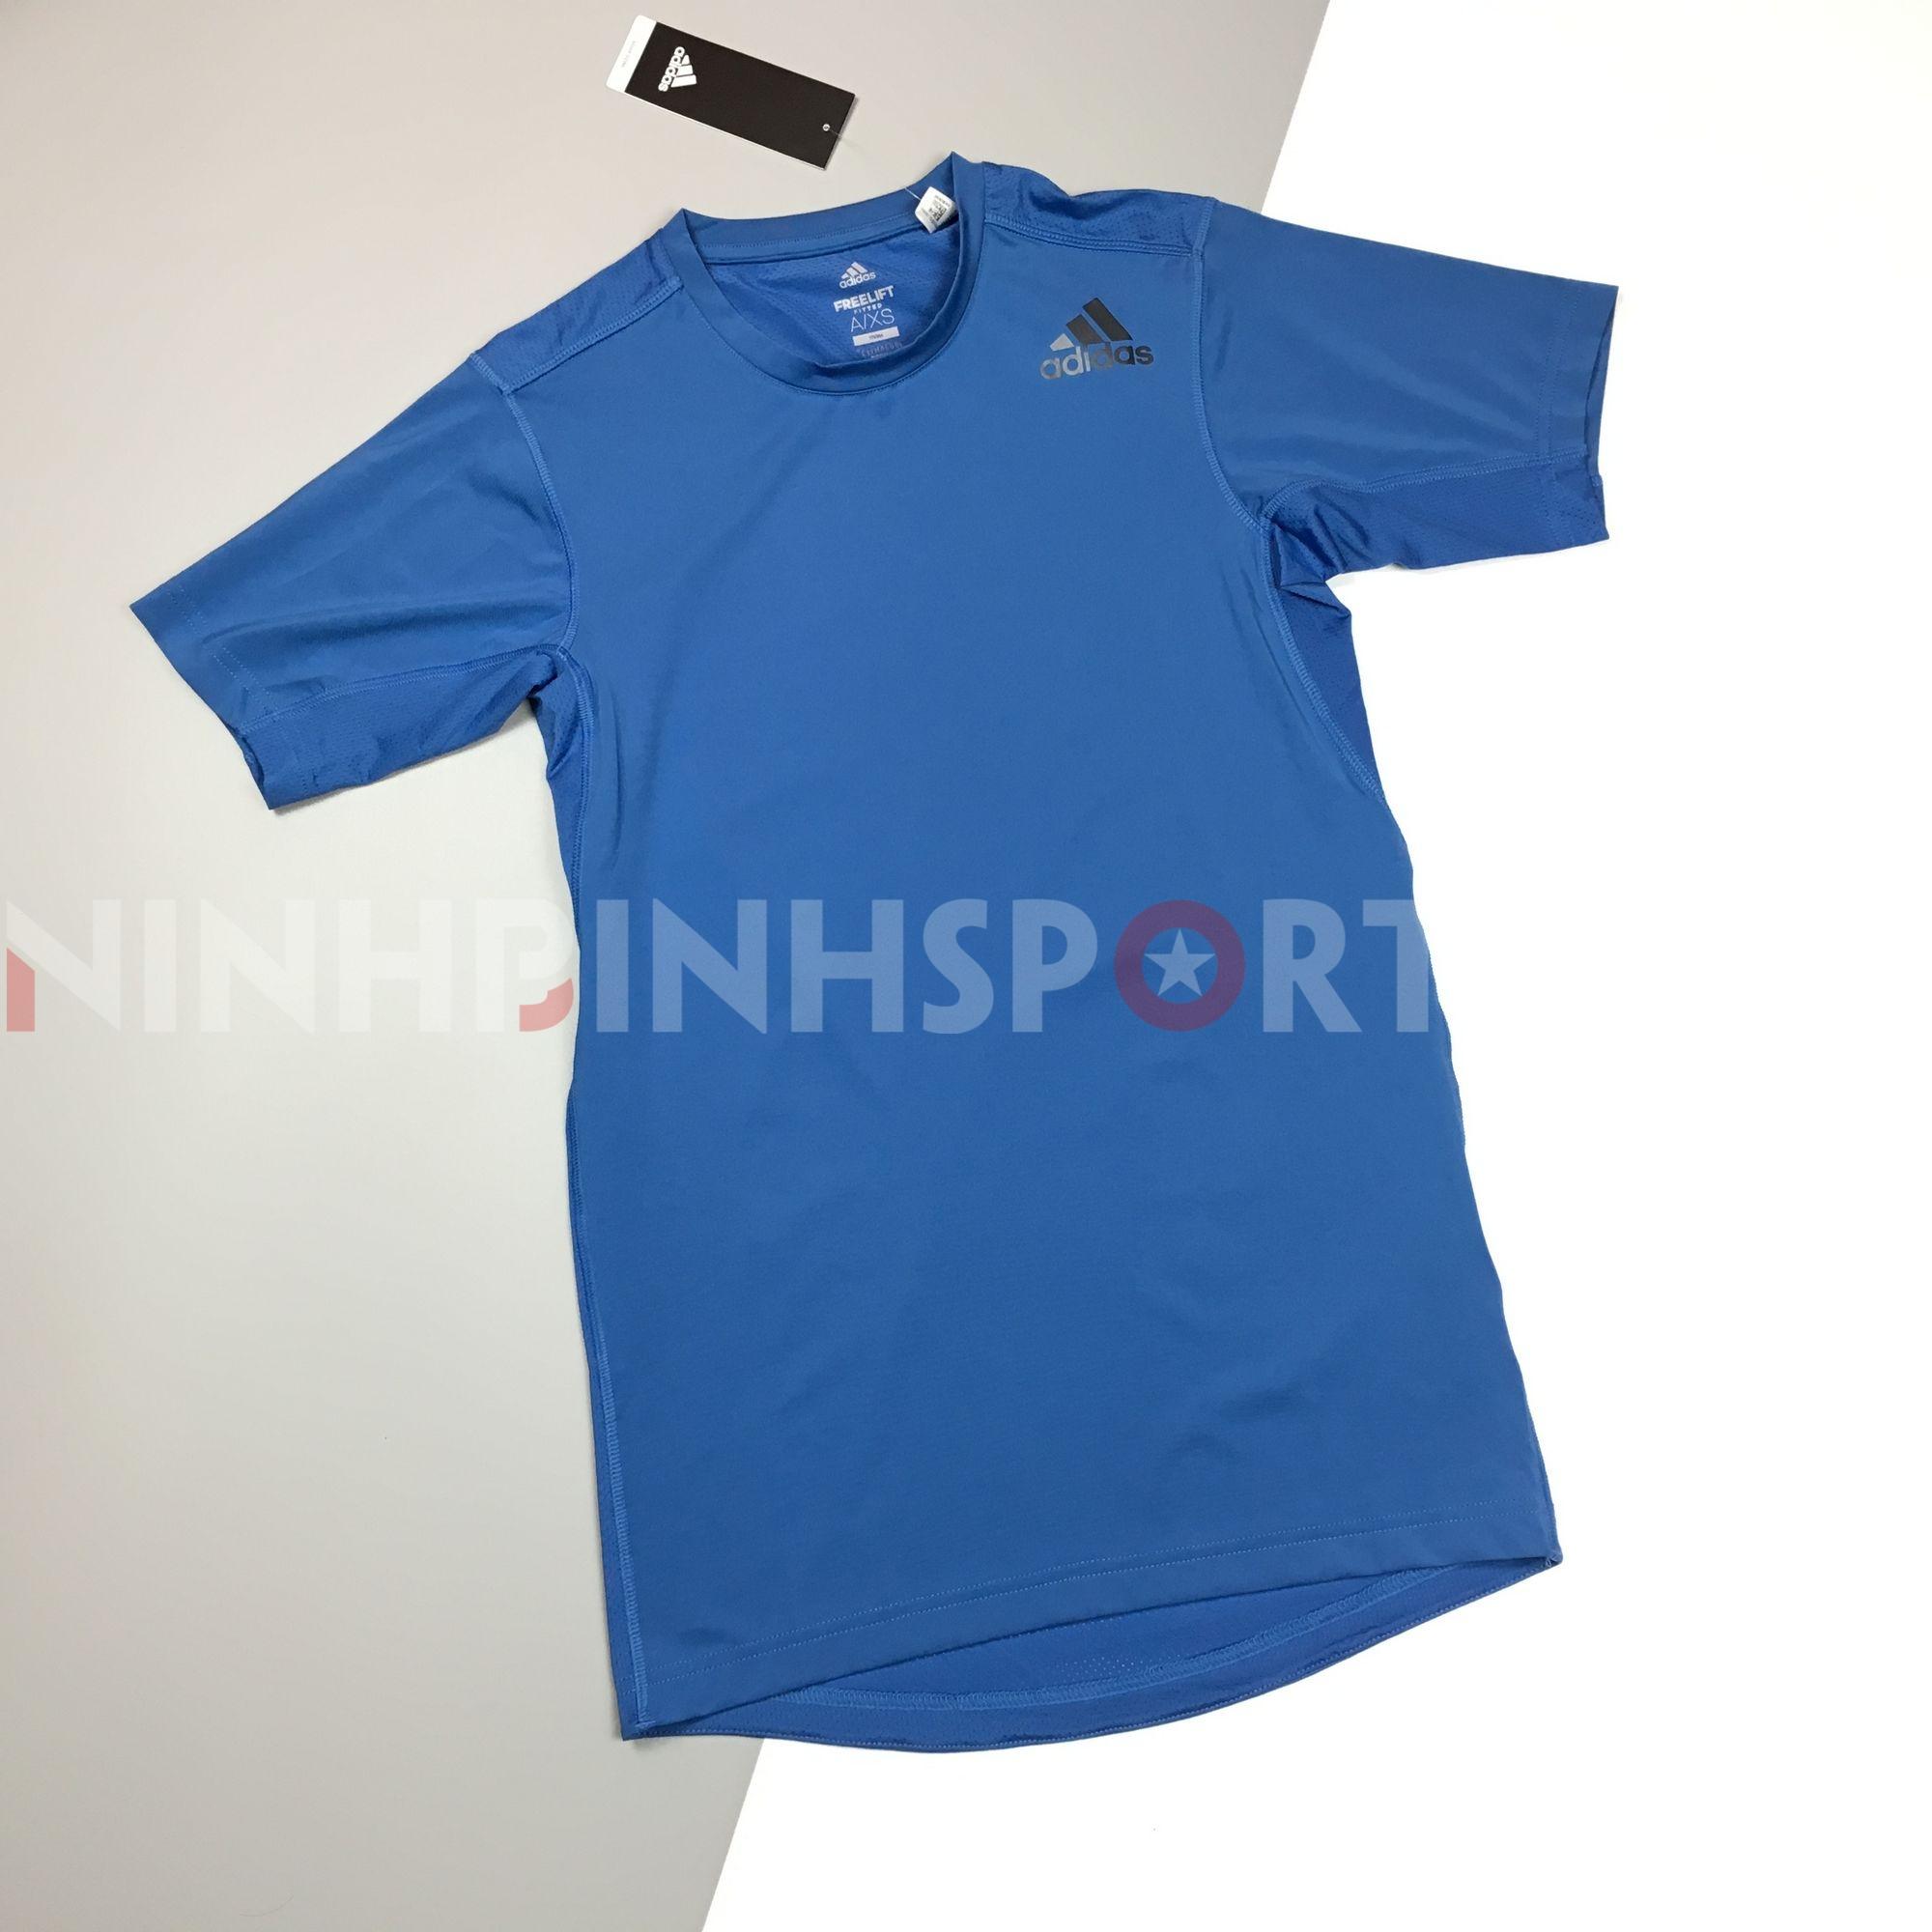 Áo thể thao nam Adidas FreeLift Fitted Elite Tee - Blue CE0829